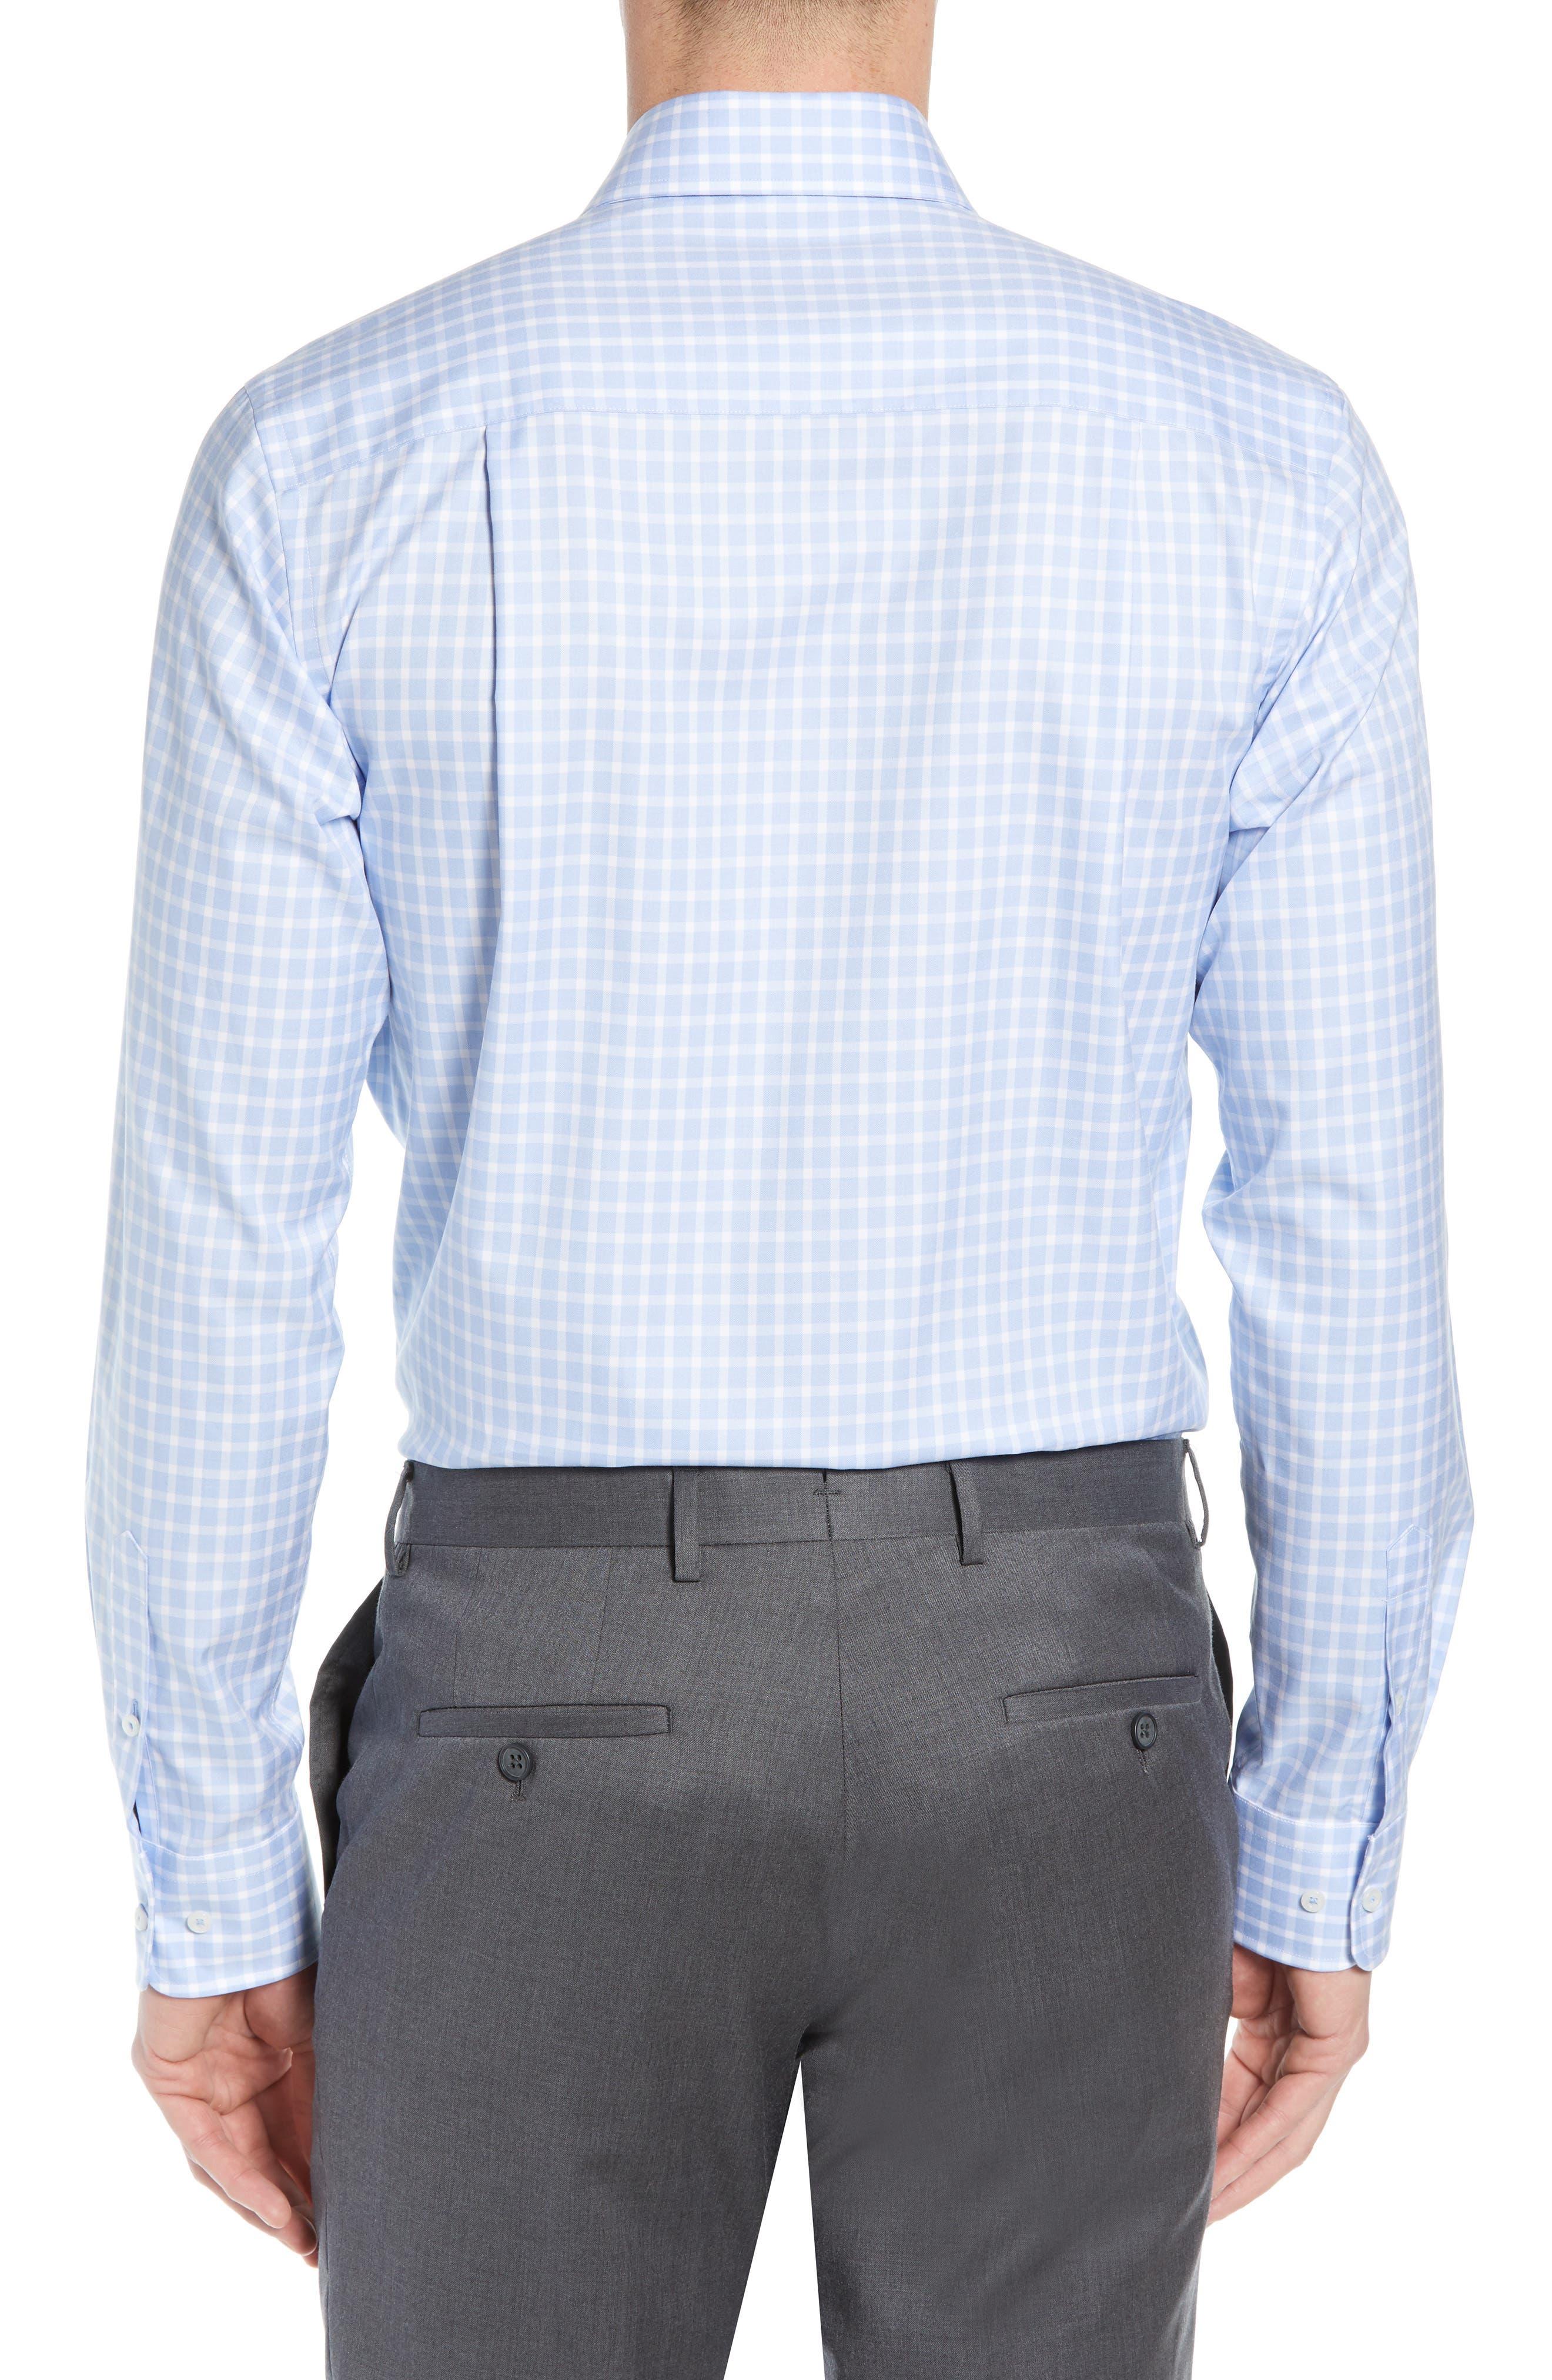 DAVID DONAHUE, Trim Fit Check Dress Shirt, Alternate thumbnail 3, color, BLUE